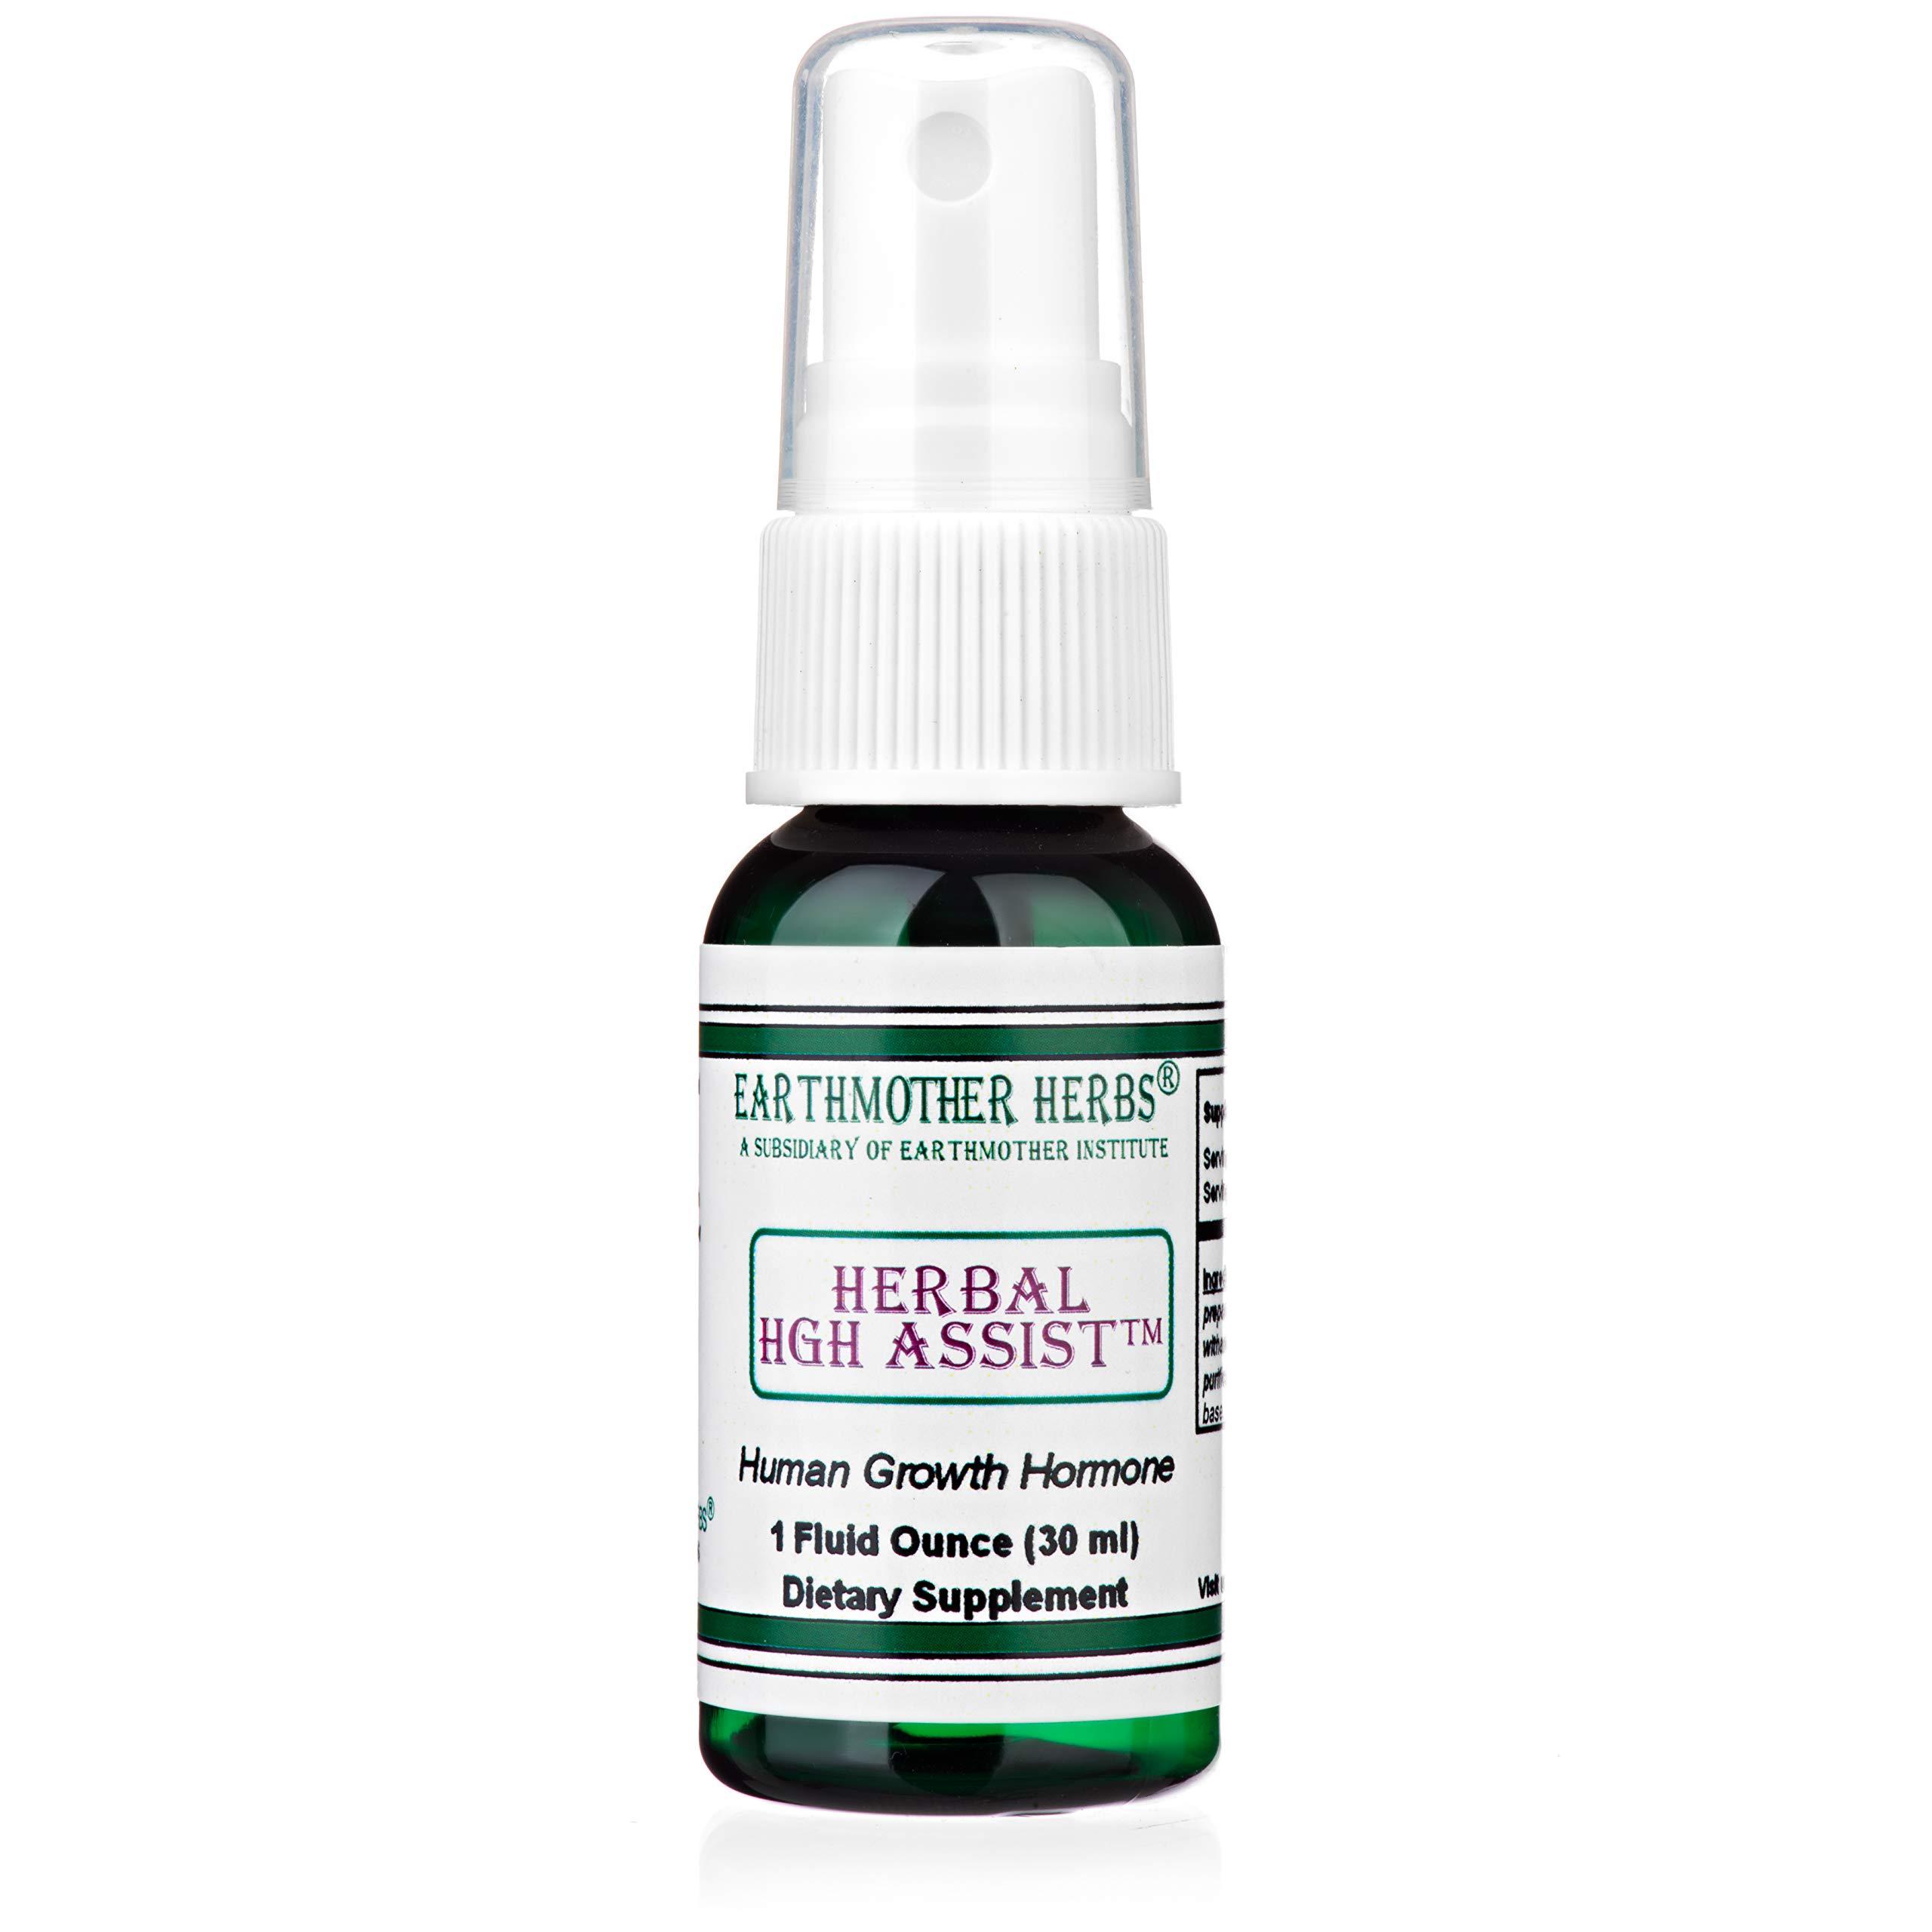 Earthmother Herbs HGH Assist